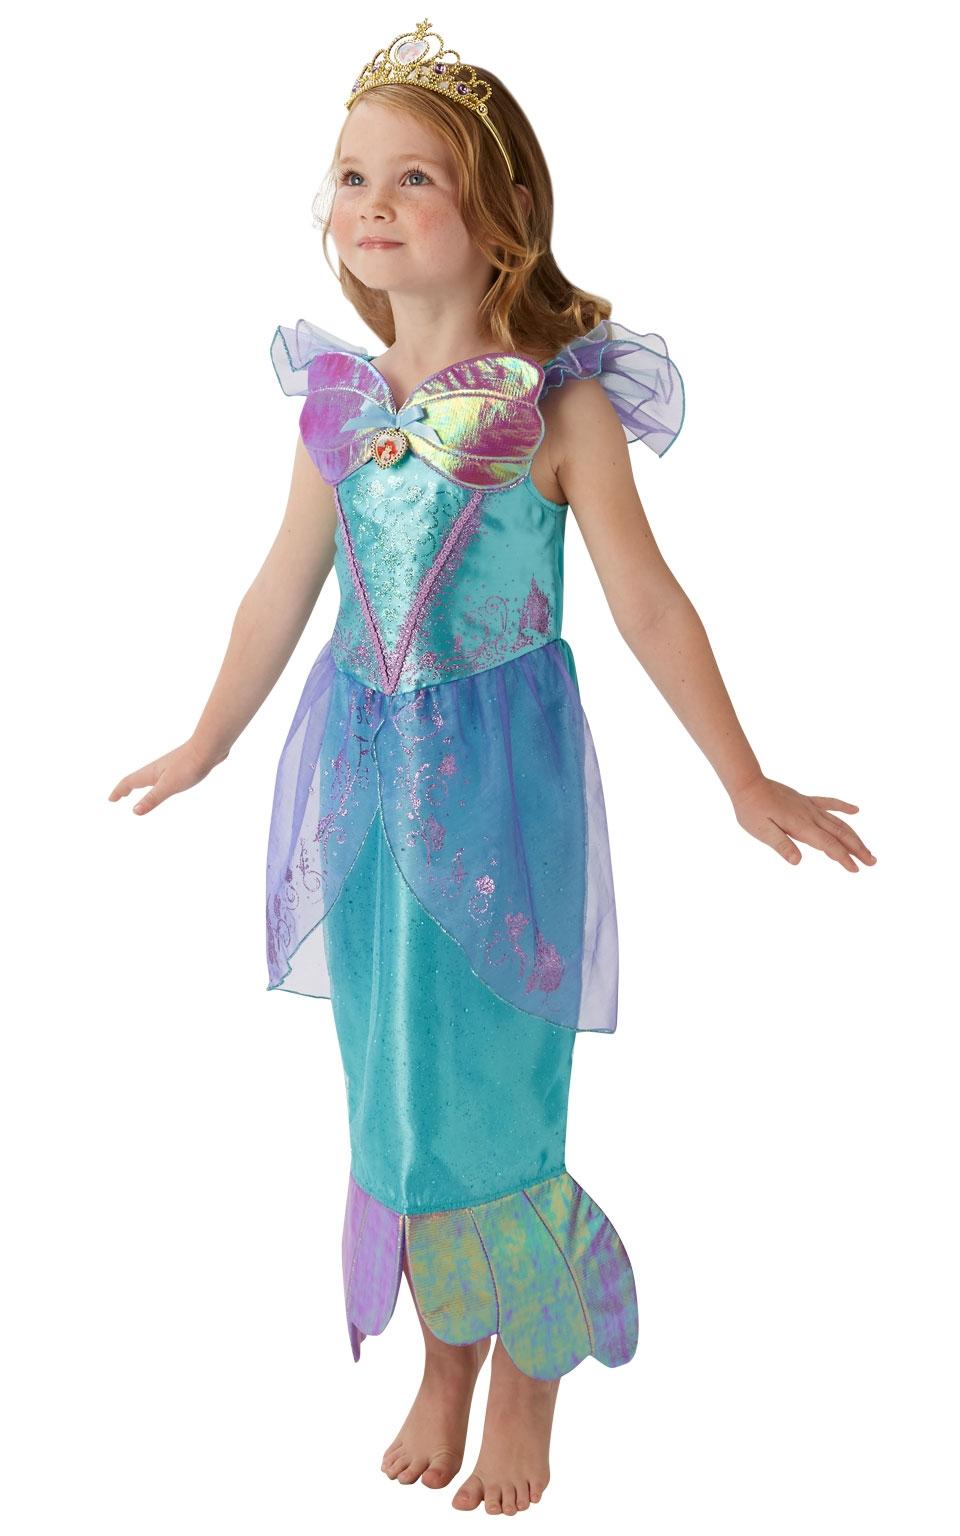 Костюм Ариэль Disney (28-30) детский костюм озорного клоуна 34